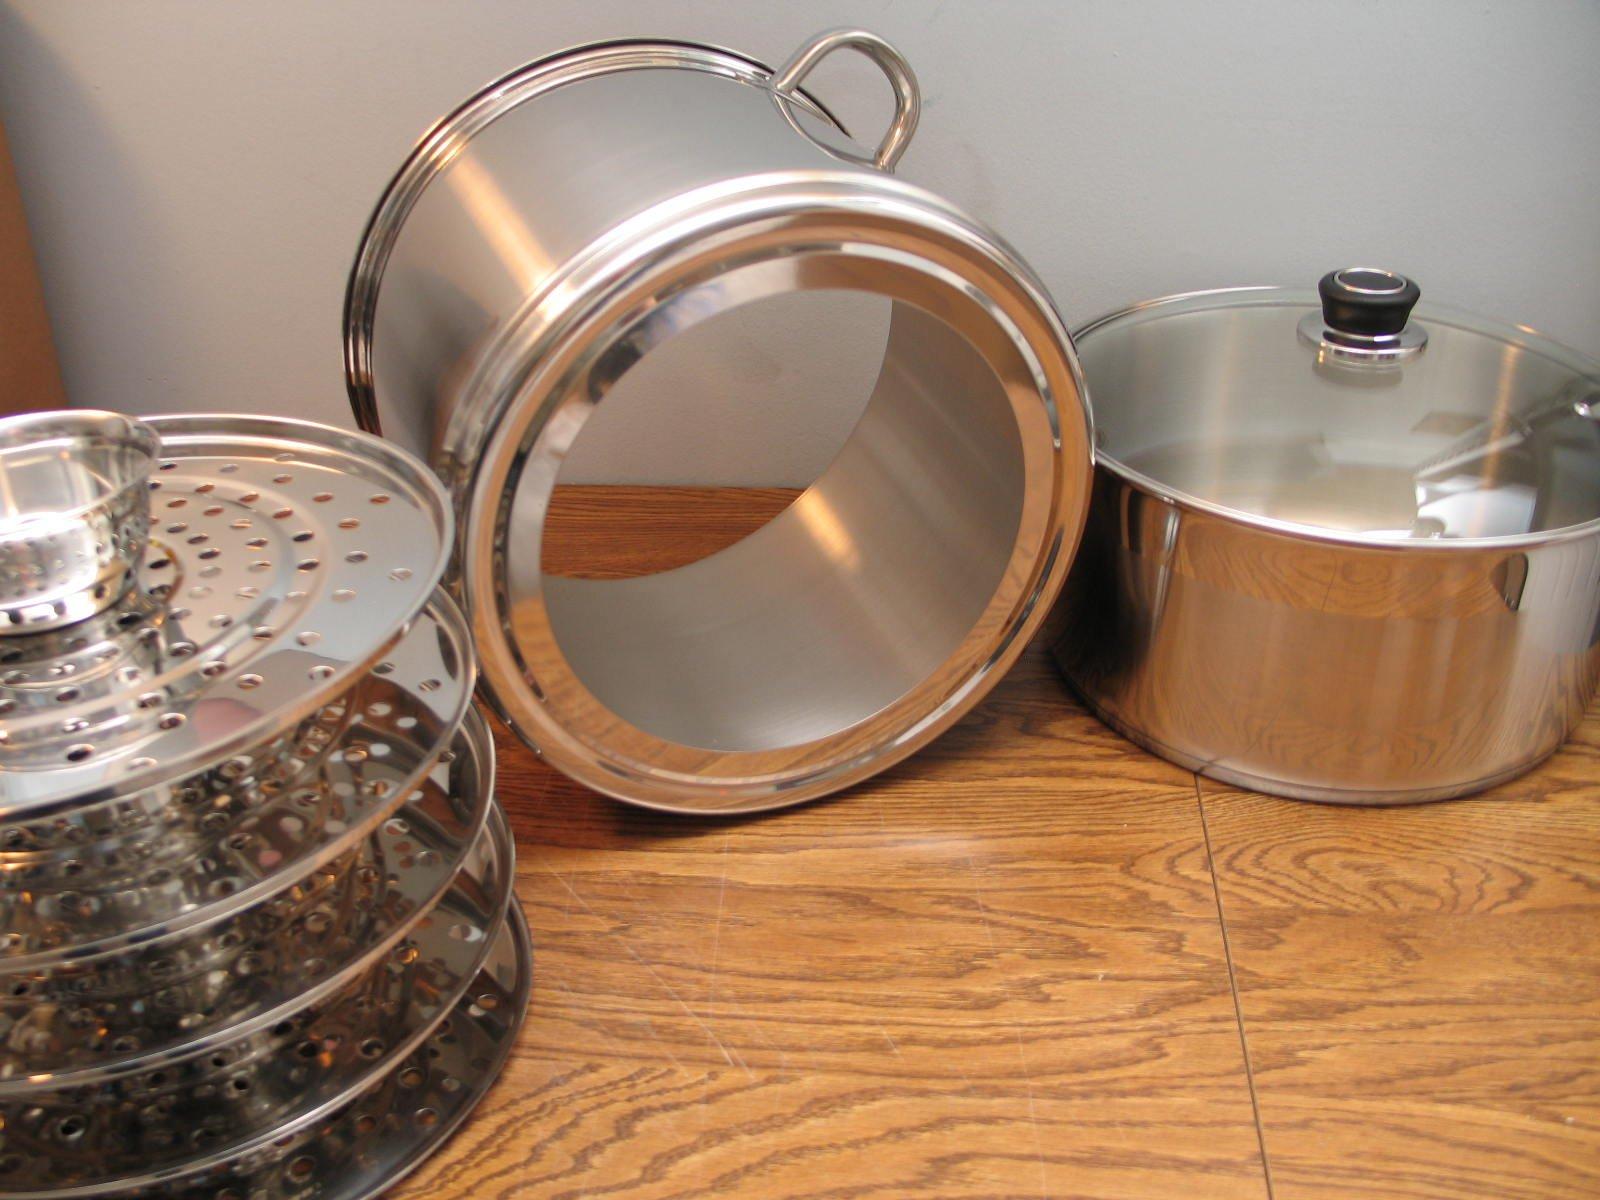 5 Tier/Level 18 qt Uzbek 18/10 Stainless Steel Steamer Cooker Warmer w/Tempered Glass Cover for Dumplings, Ravioli, Vegetables, Fish, Manti, Mantovarka